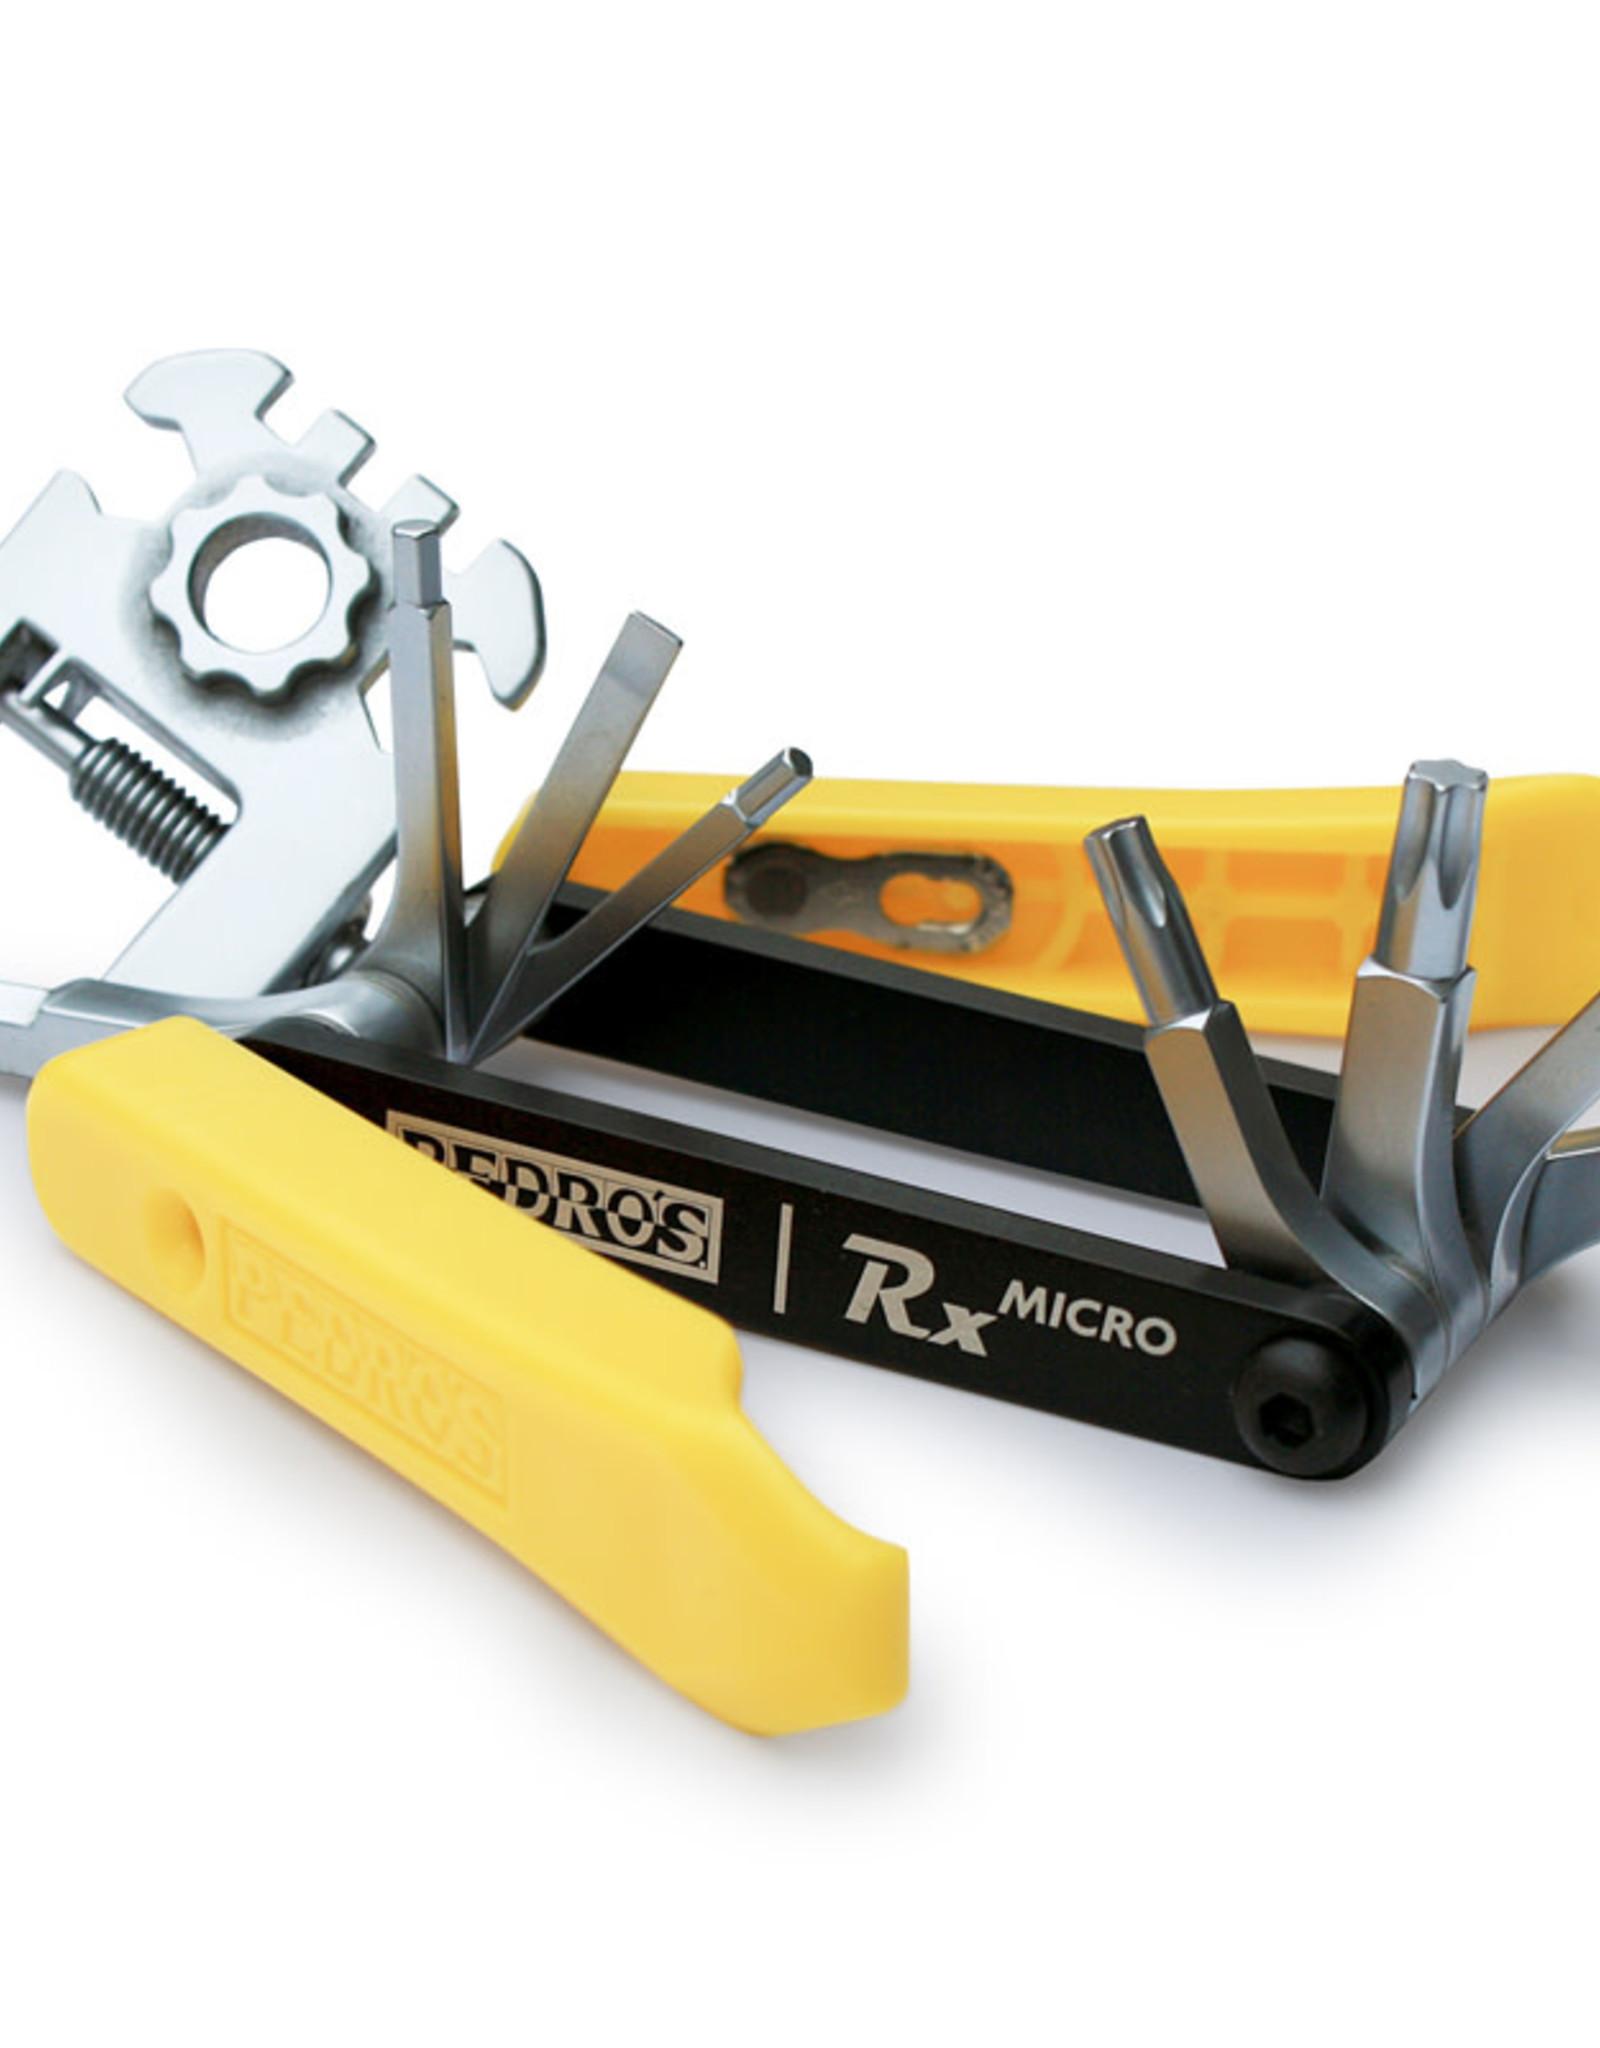 Rx Micro-20 Multitool